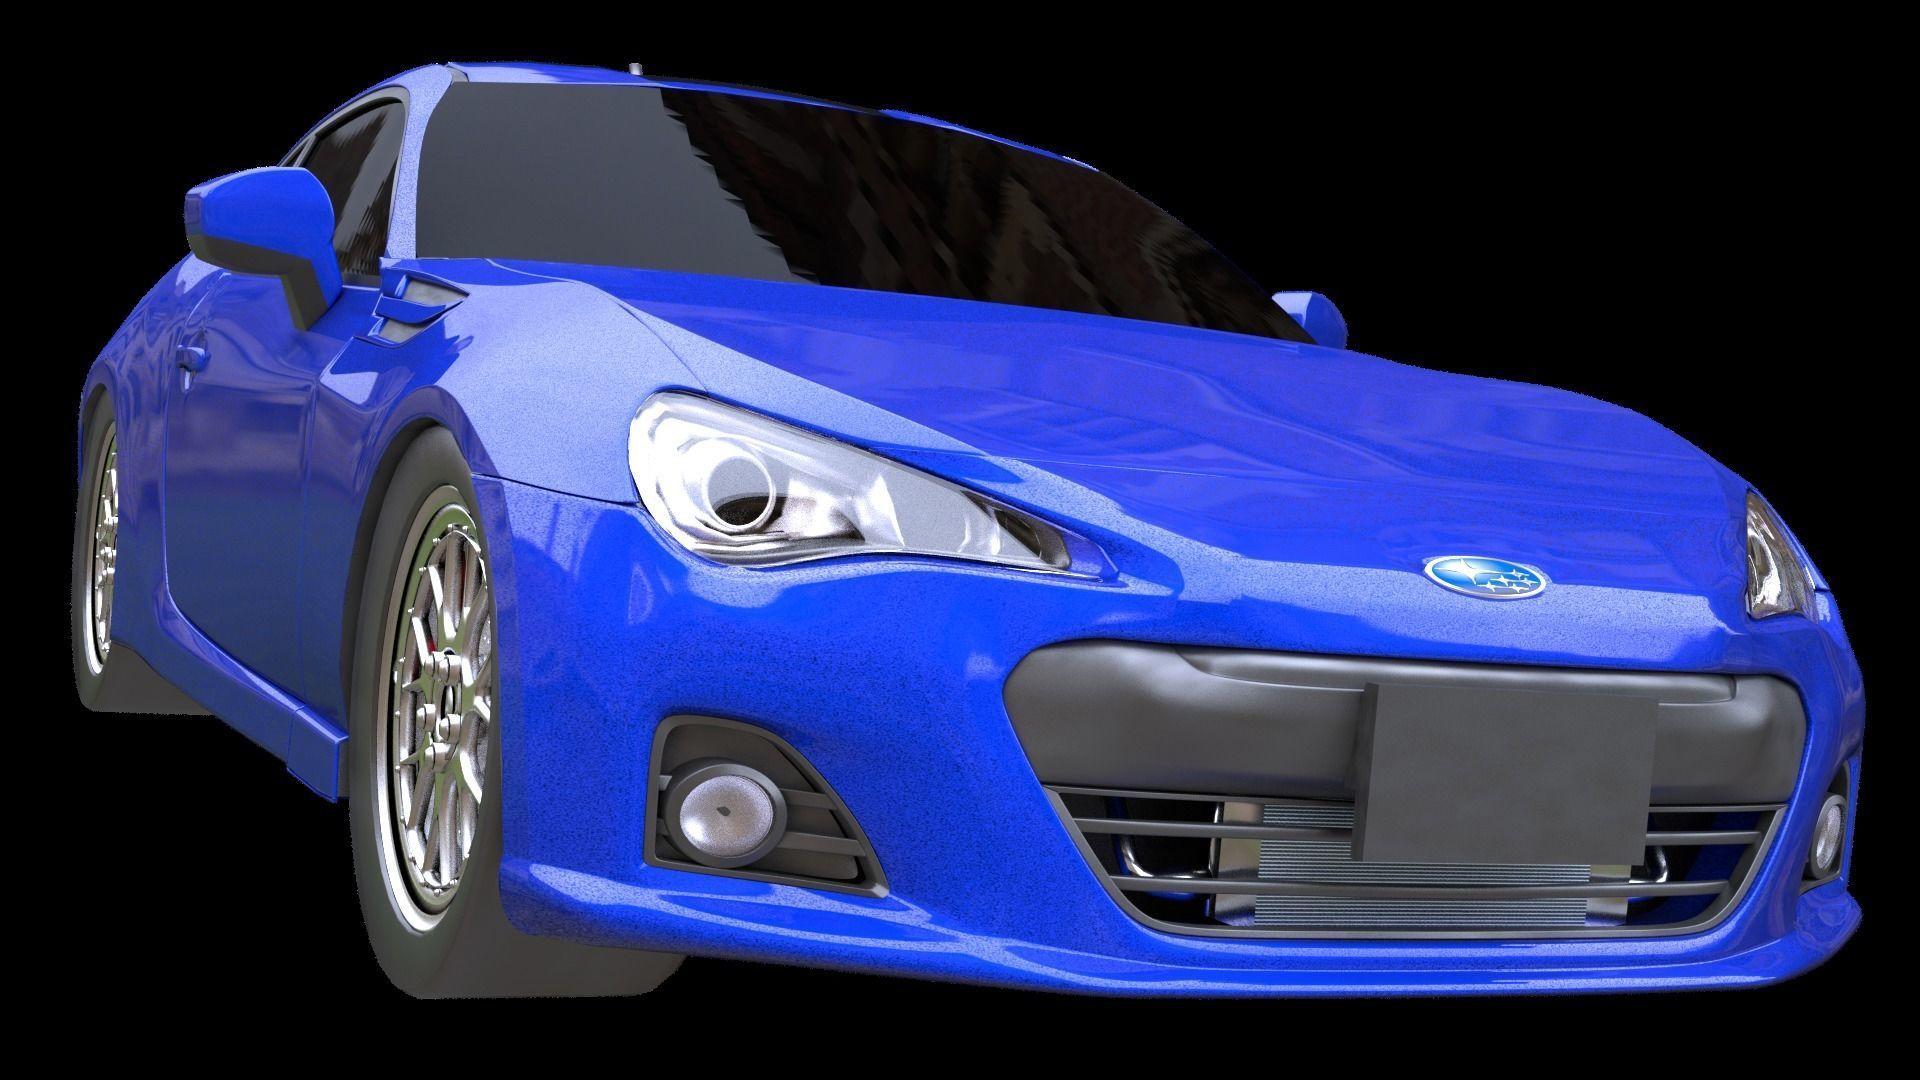 Subaru BRZ or Toyota Ae86 or Scion FRS japan 3D model